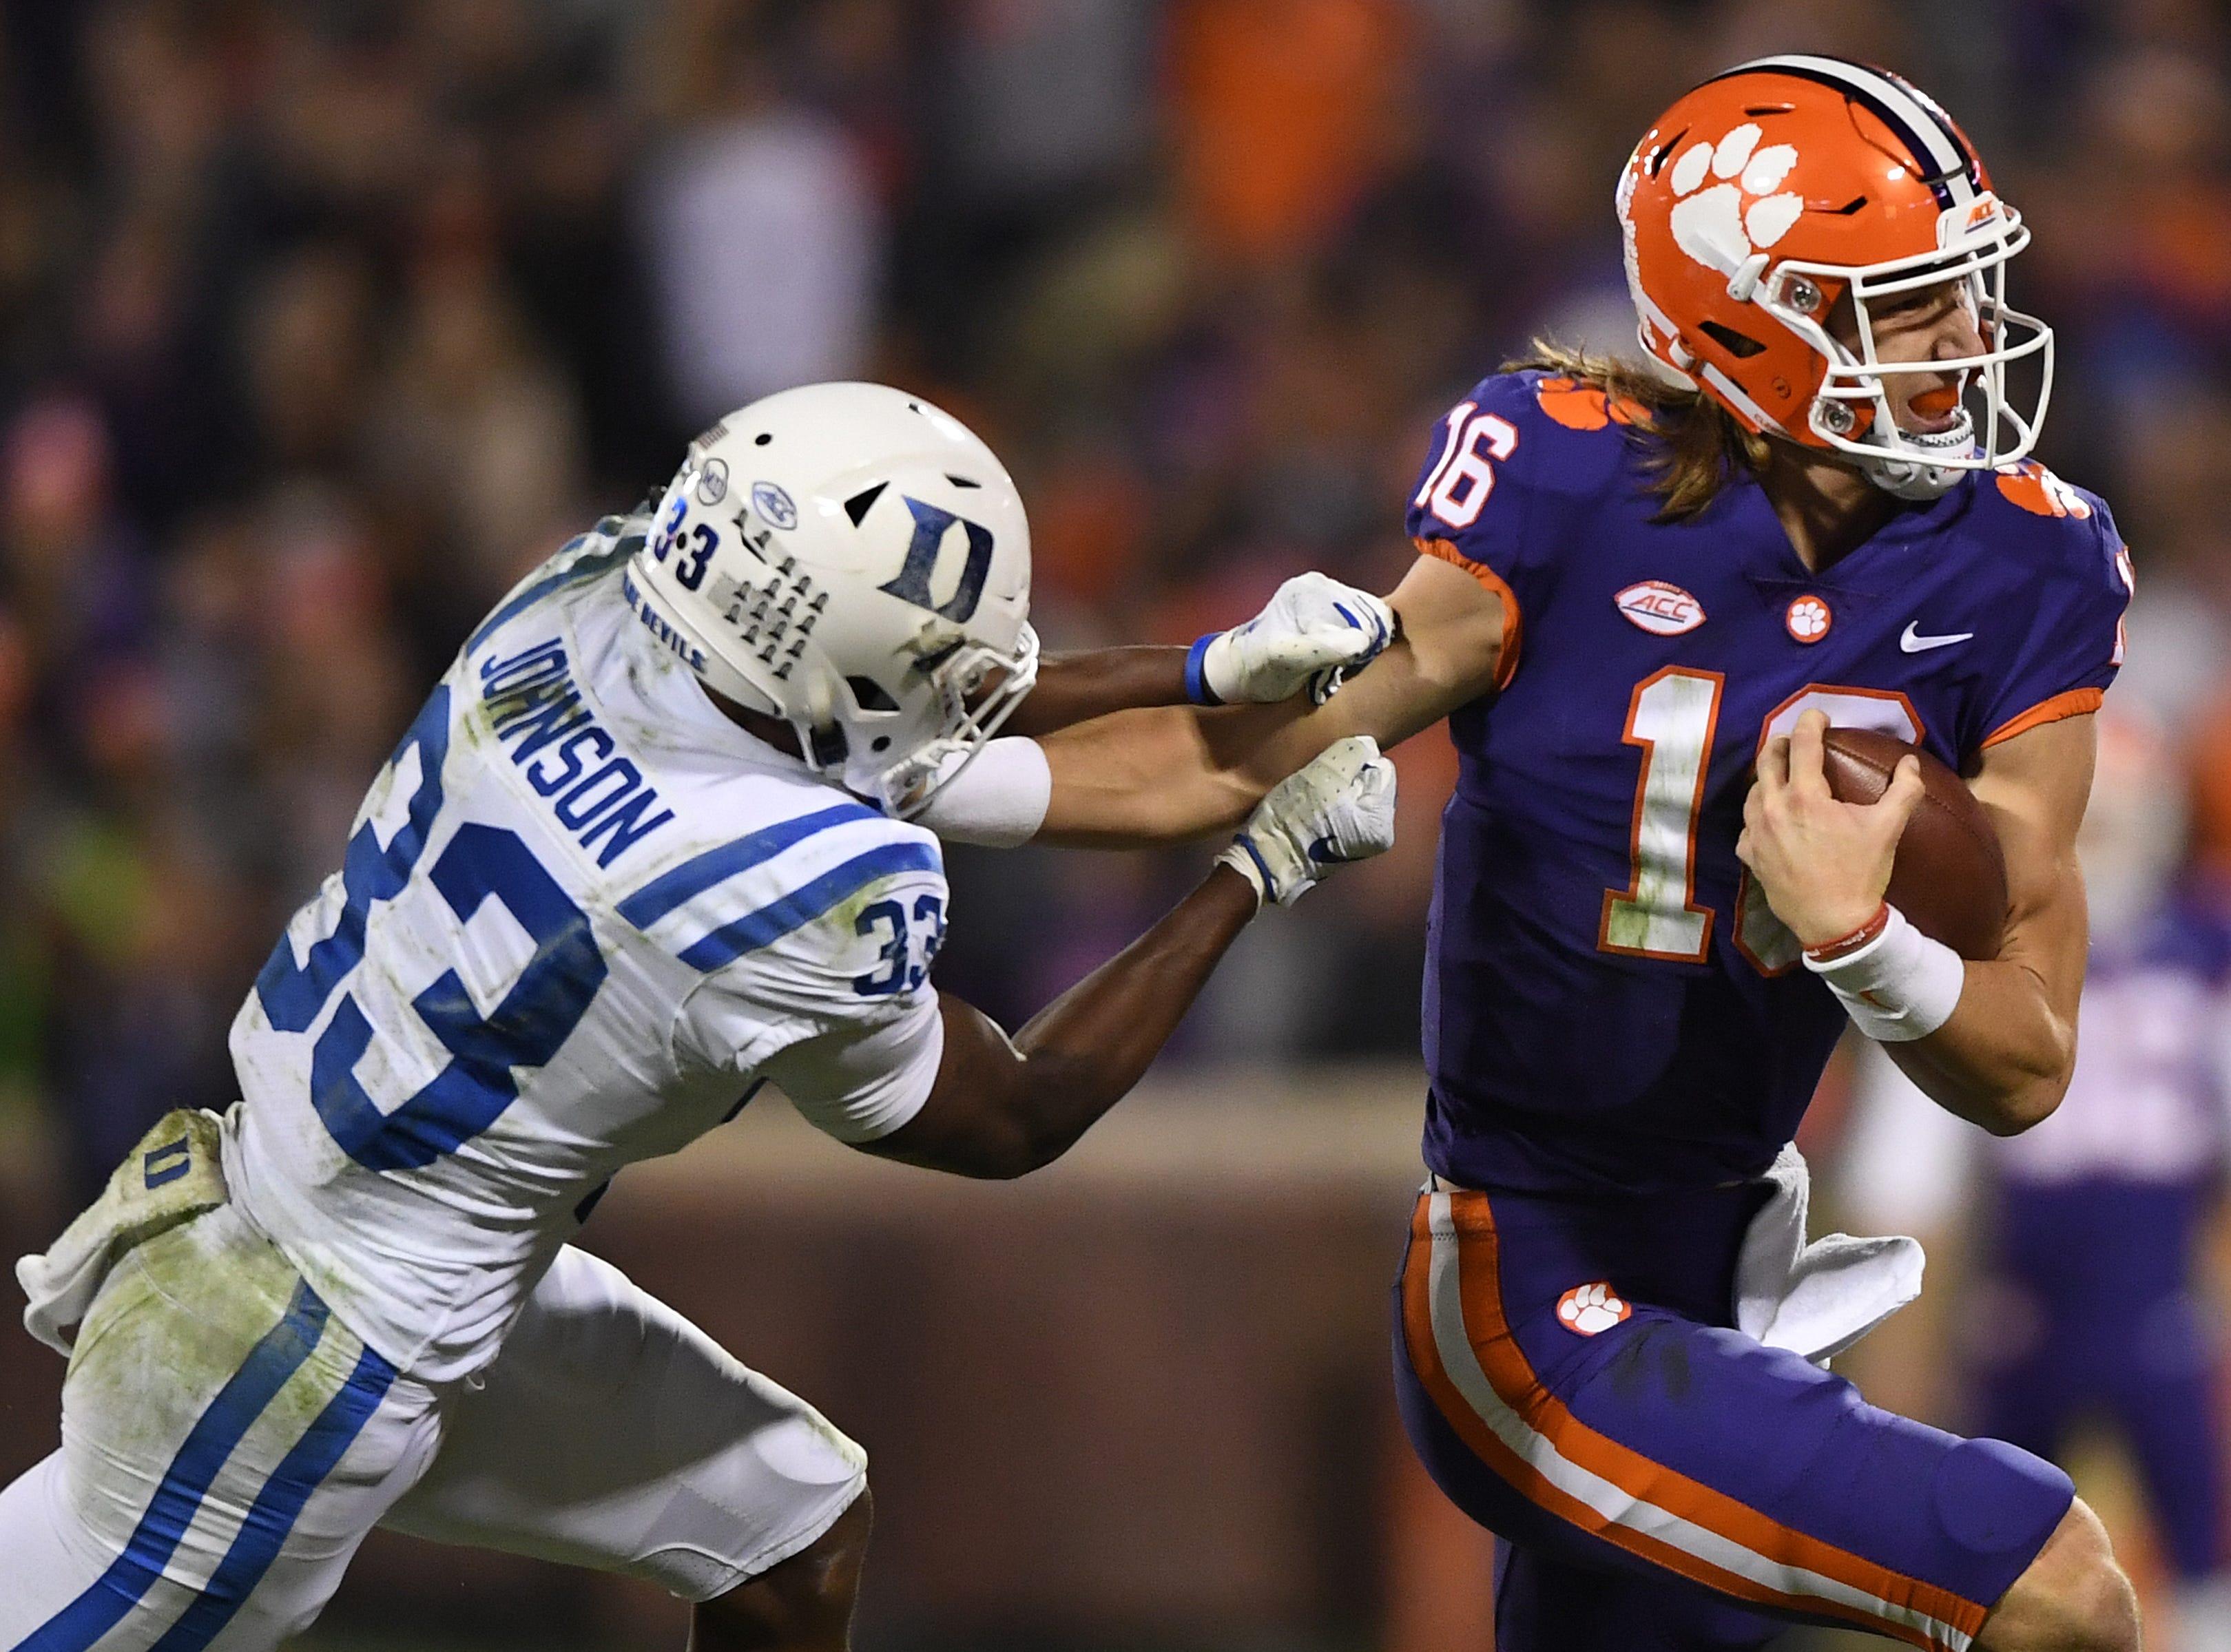 Duke safety Leonard Johnson (33) tries to bring down Clemson quarterback Trevor Lawrence (16) during the 4th quarter Saturday, November 17, 2018 at Clemson's Memorial Stadium.